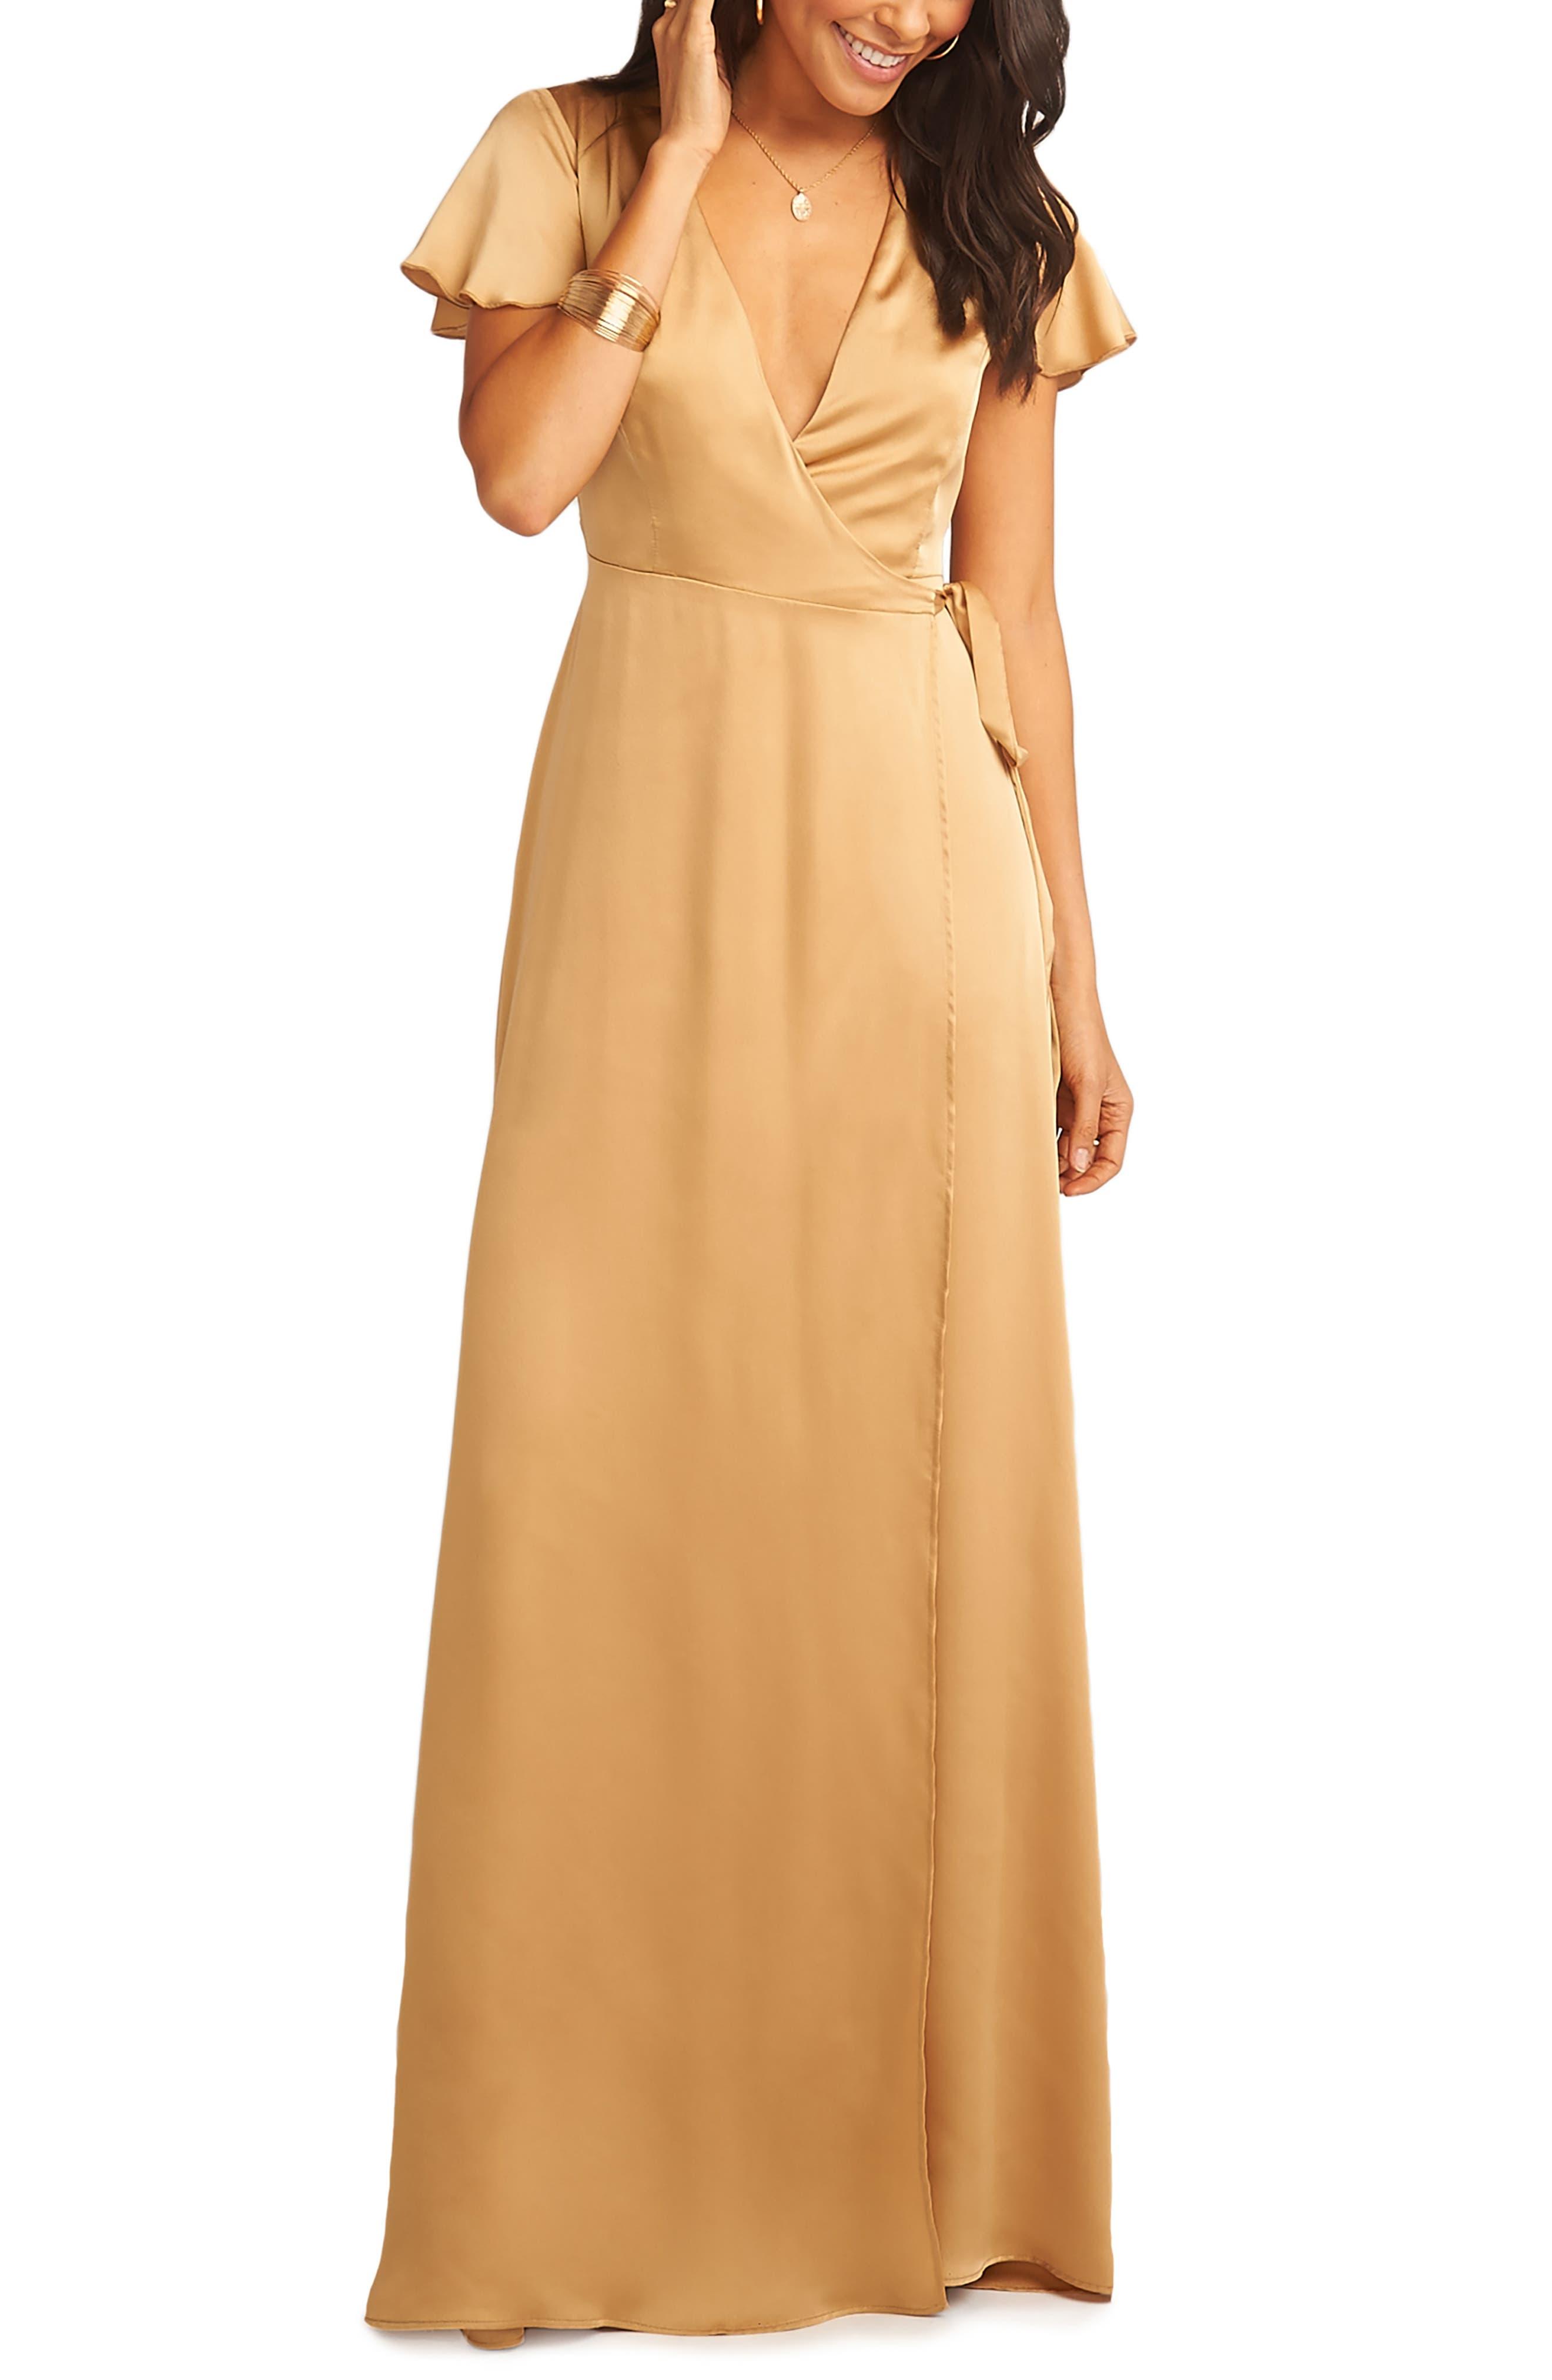 1960s – 70s Cocktail, Party, Prom, Evening Dresses Womens Show Me Your Mumu Noelle Satin Wrap Evening Dress $216.00 AT vintagedancer.com